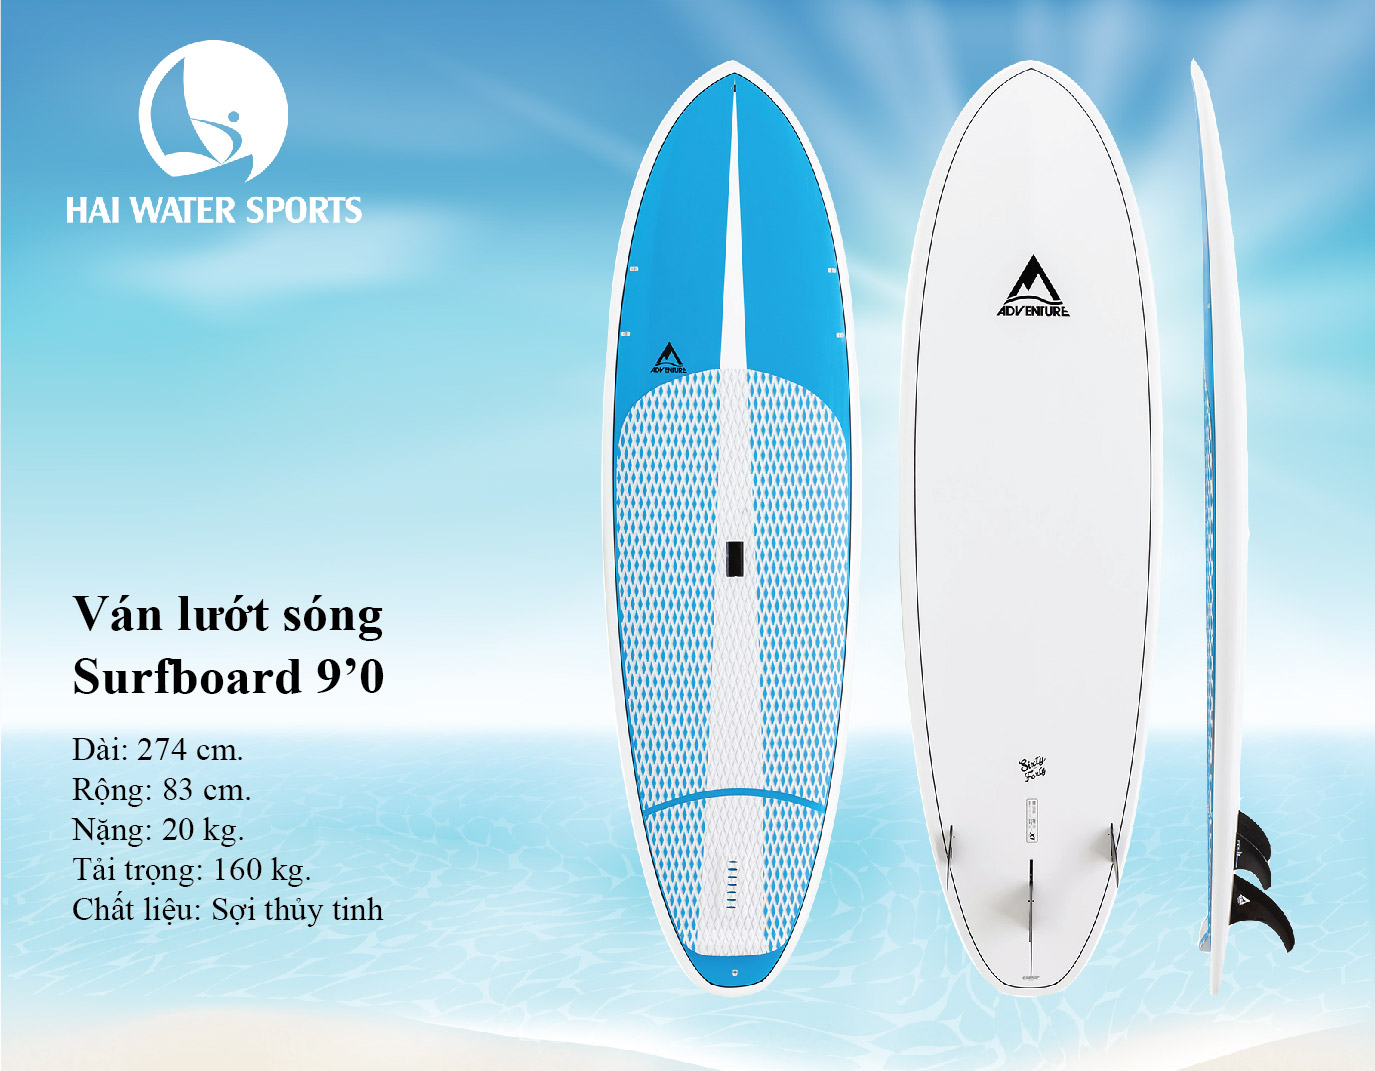 Ván lướt sóng - Surfboard 9'0